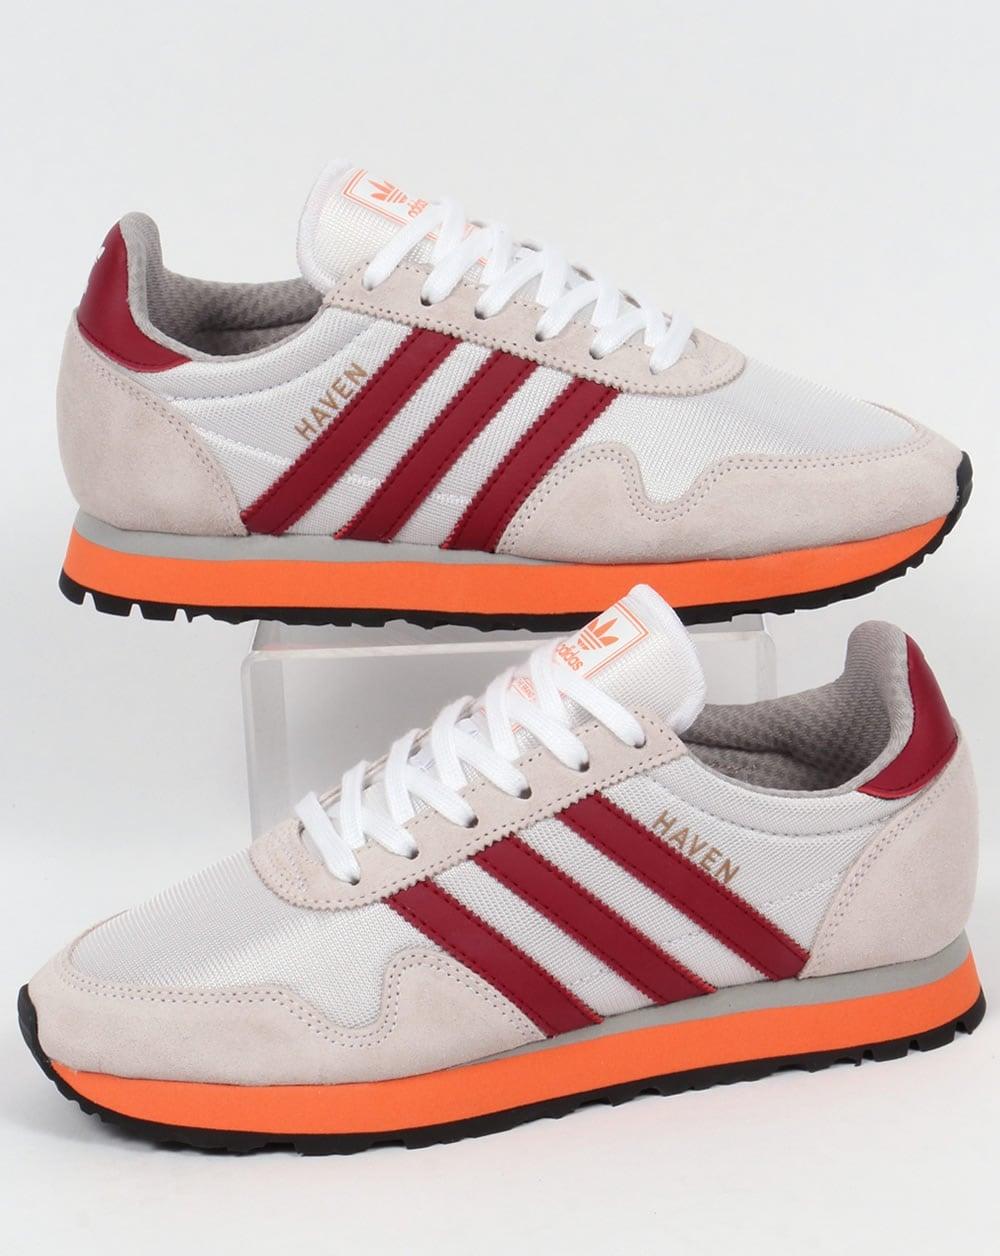 on sale 8b62d 103b5 adidas trainers classics